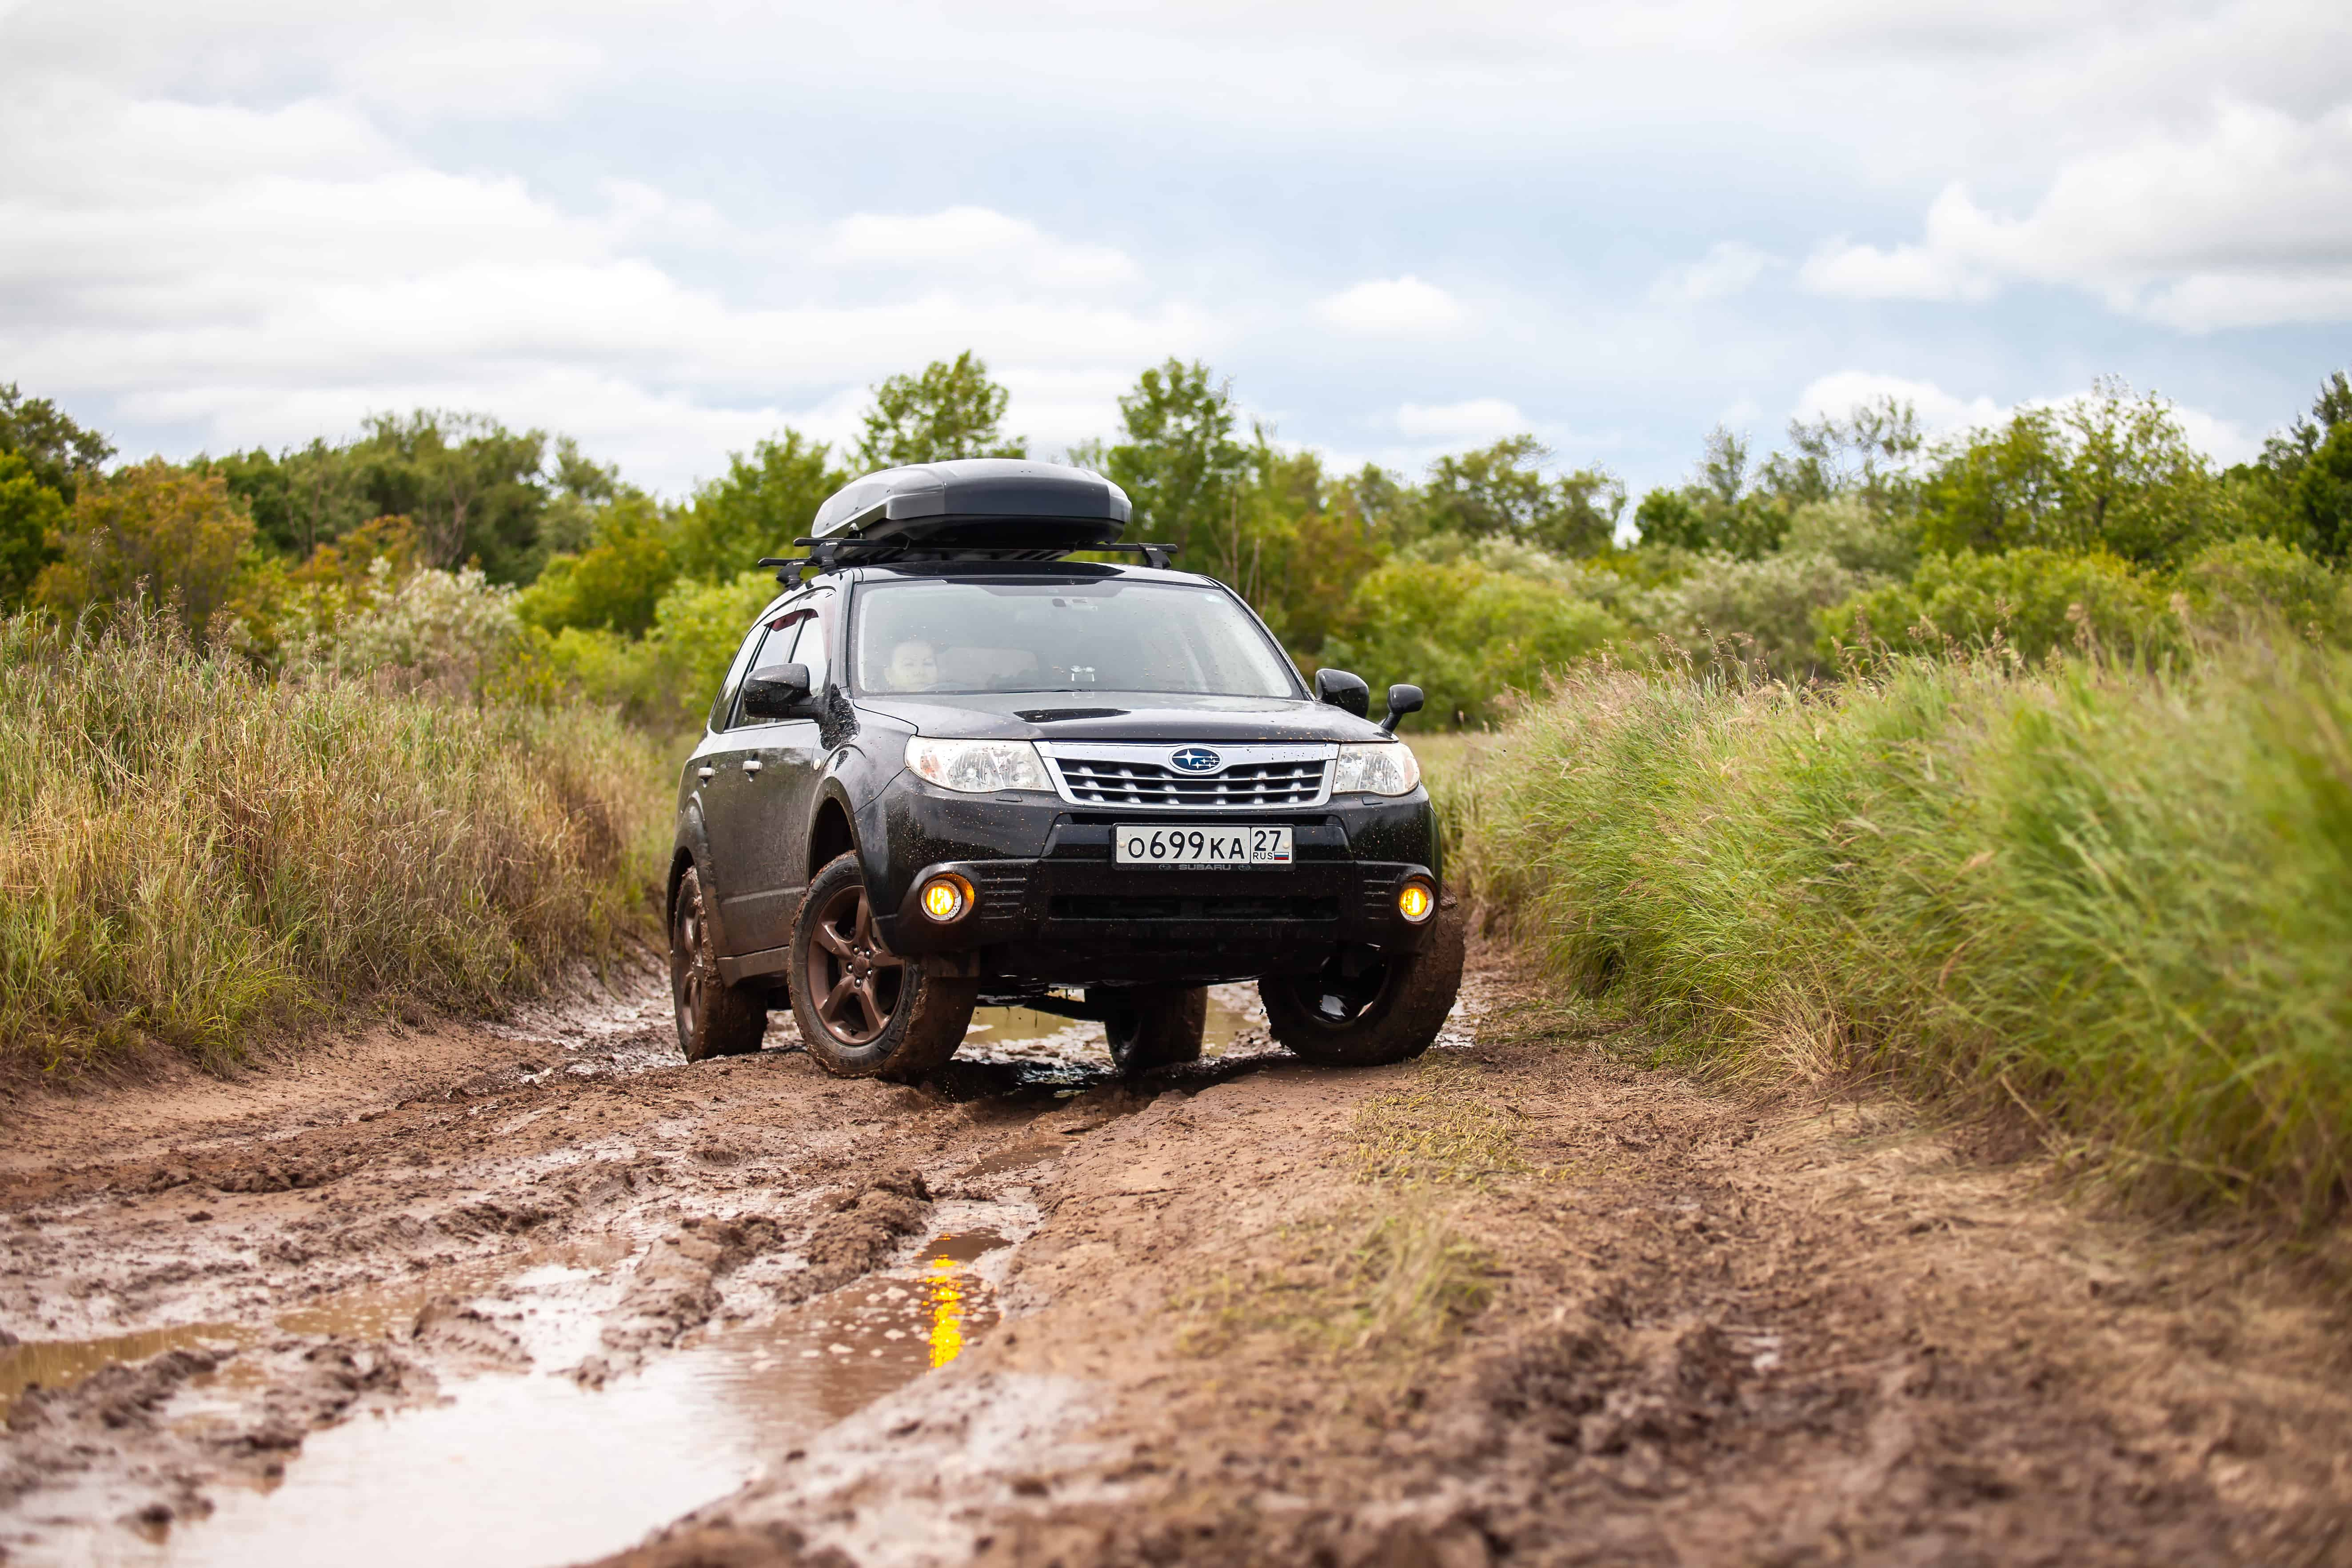 Another Recall Ordered For Subaru Impreza and Crosstrek Vehicles